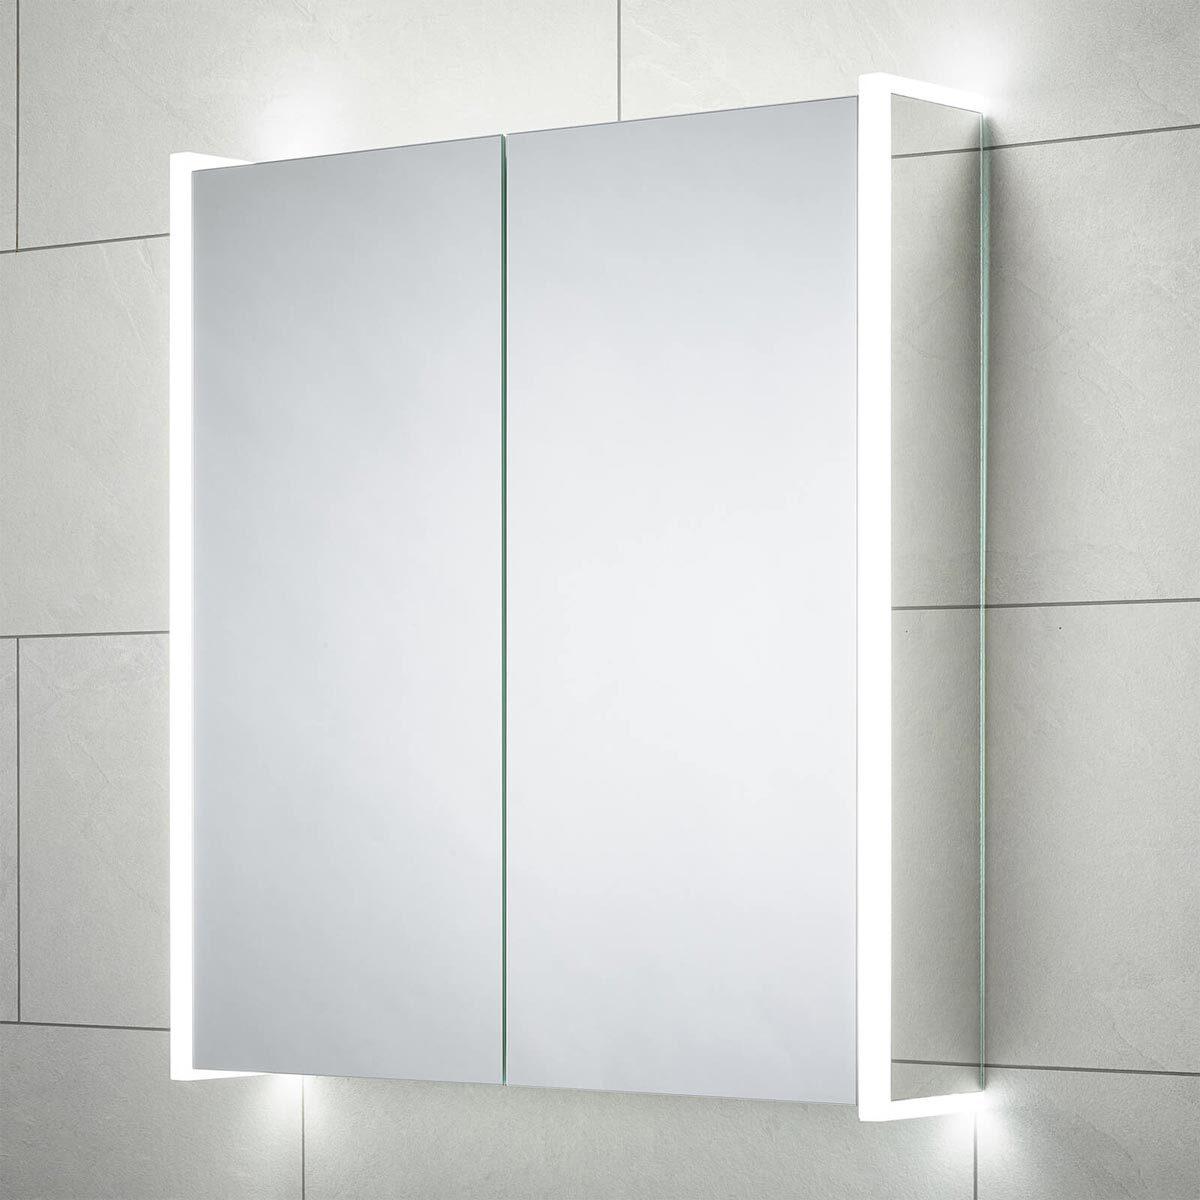 Mirrored Bathroom Cabinets & Bathroom Wall Cabinets on bathroom vanity painted off white, bathroom vanities custom-size, houzz kitchens white cabinets, bathroom design concepts, bathroom tile design,